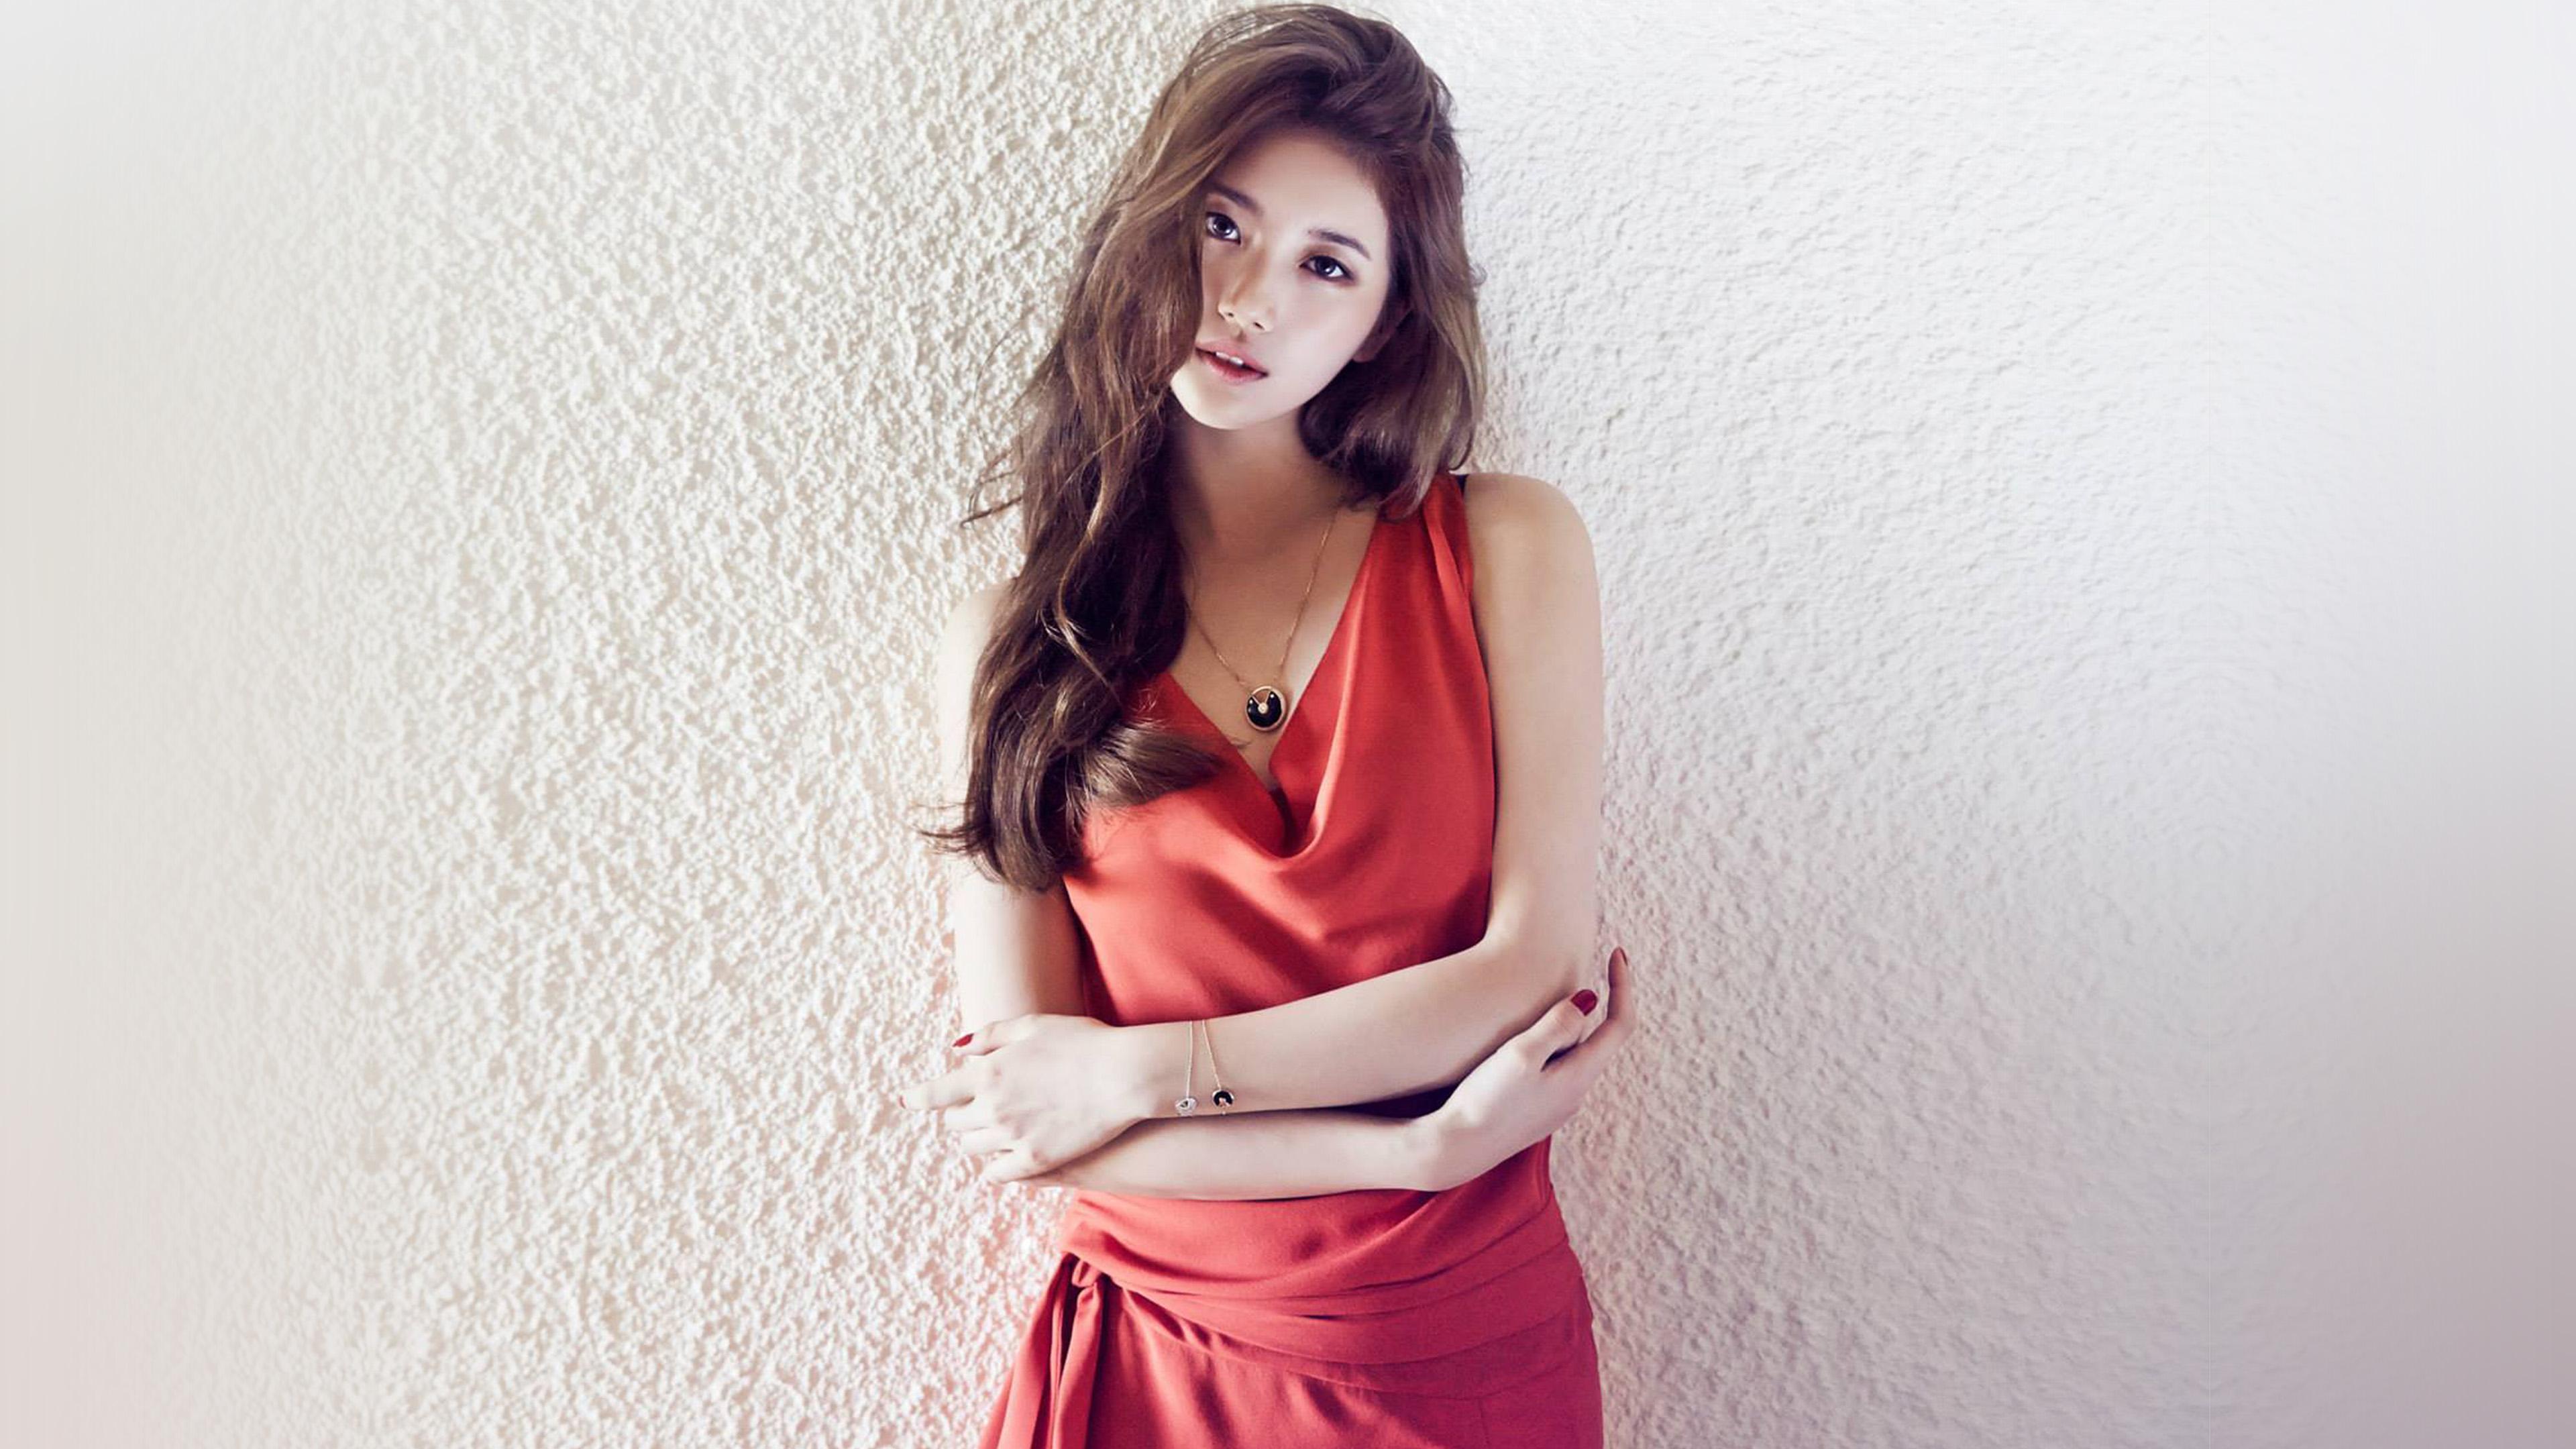 Wallpaper For Desktop Laptop Hf92 Suzy Missa Kpop Red Dress